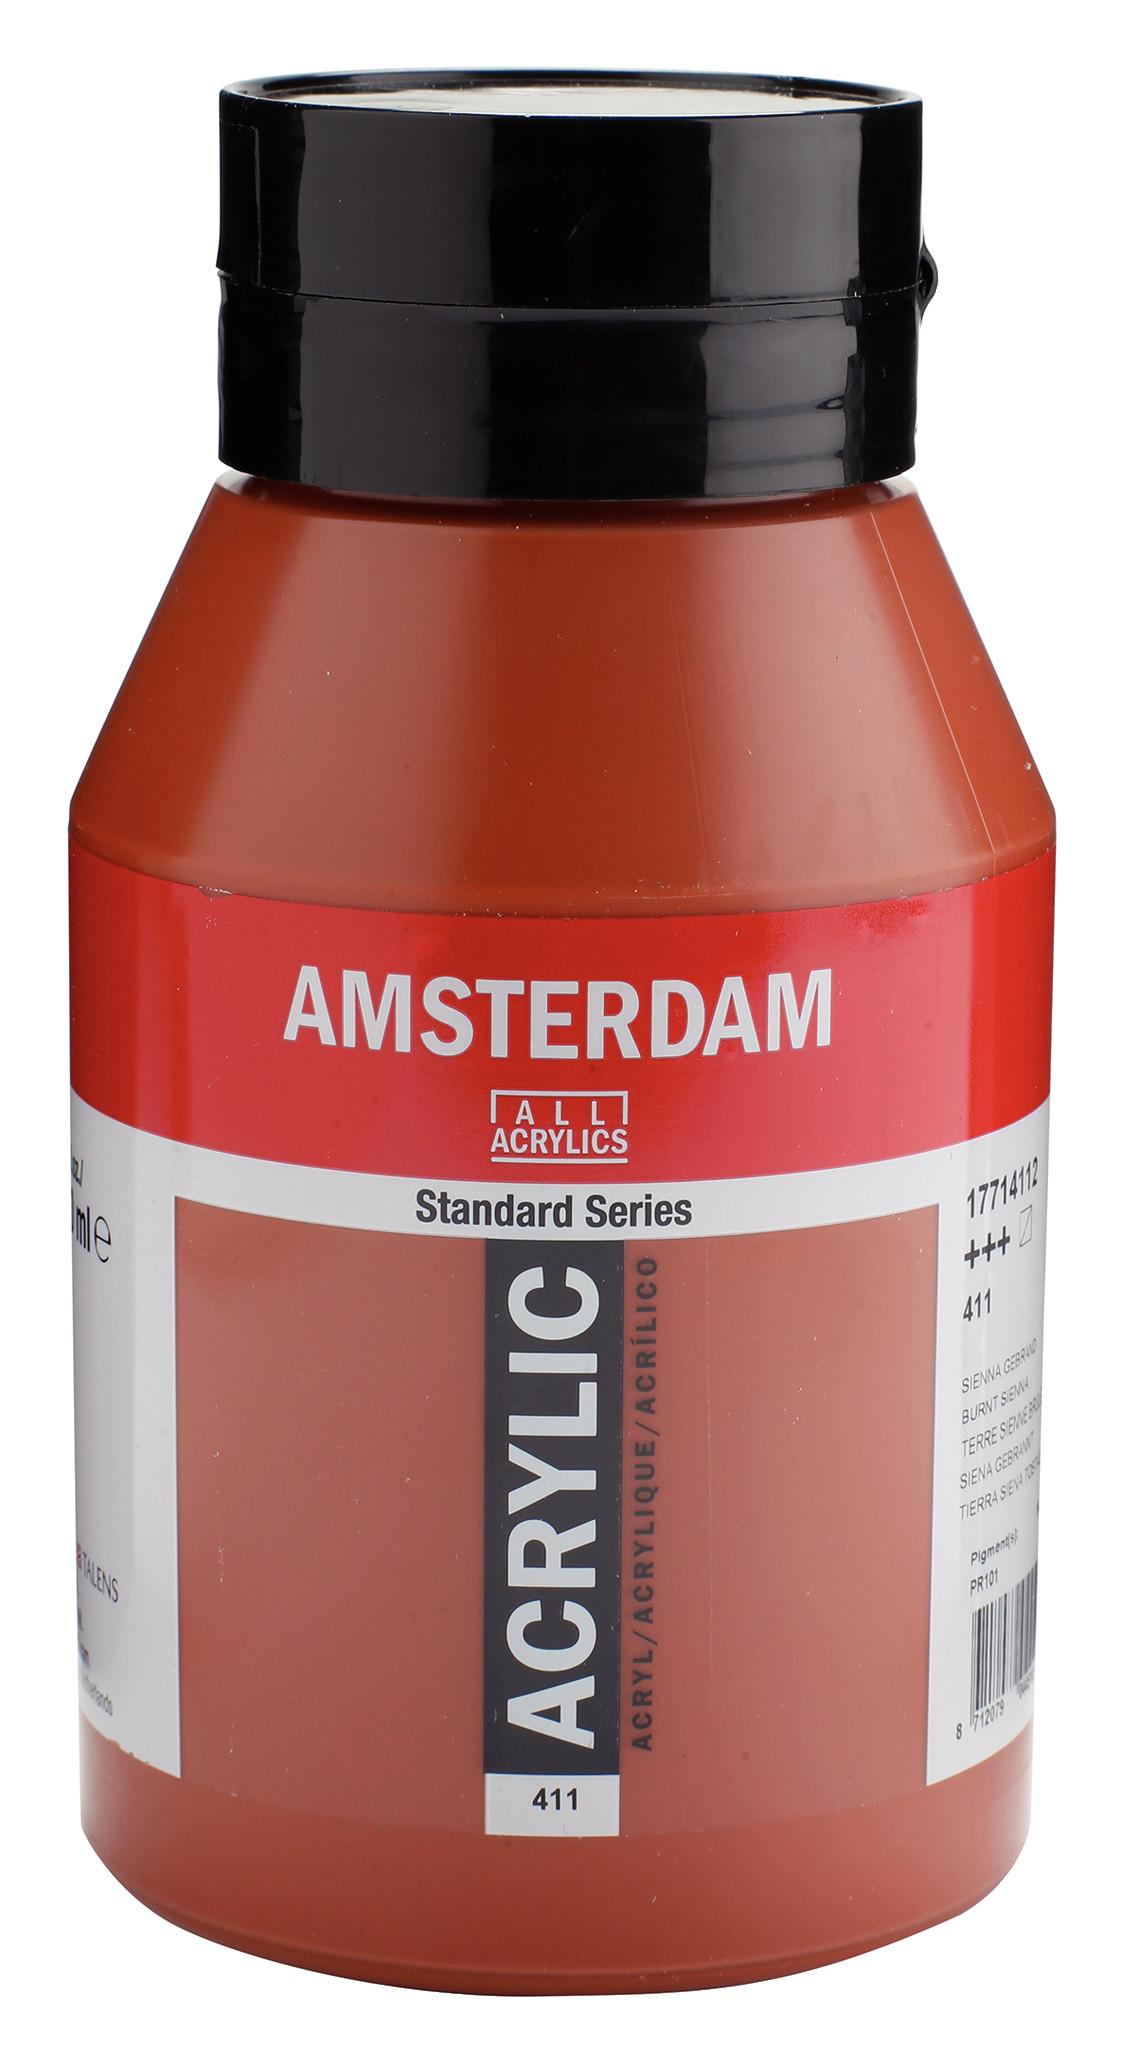 Amsterdam Standard Series Acrylic Jar 1000 ml Burnt sienna 411